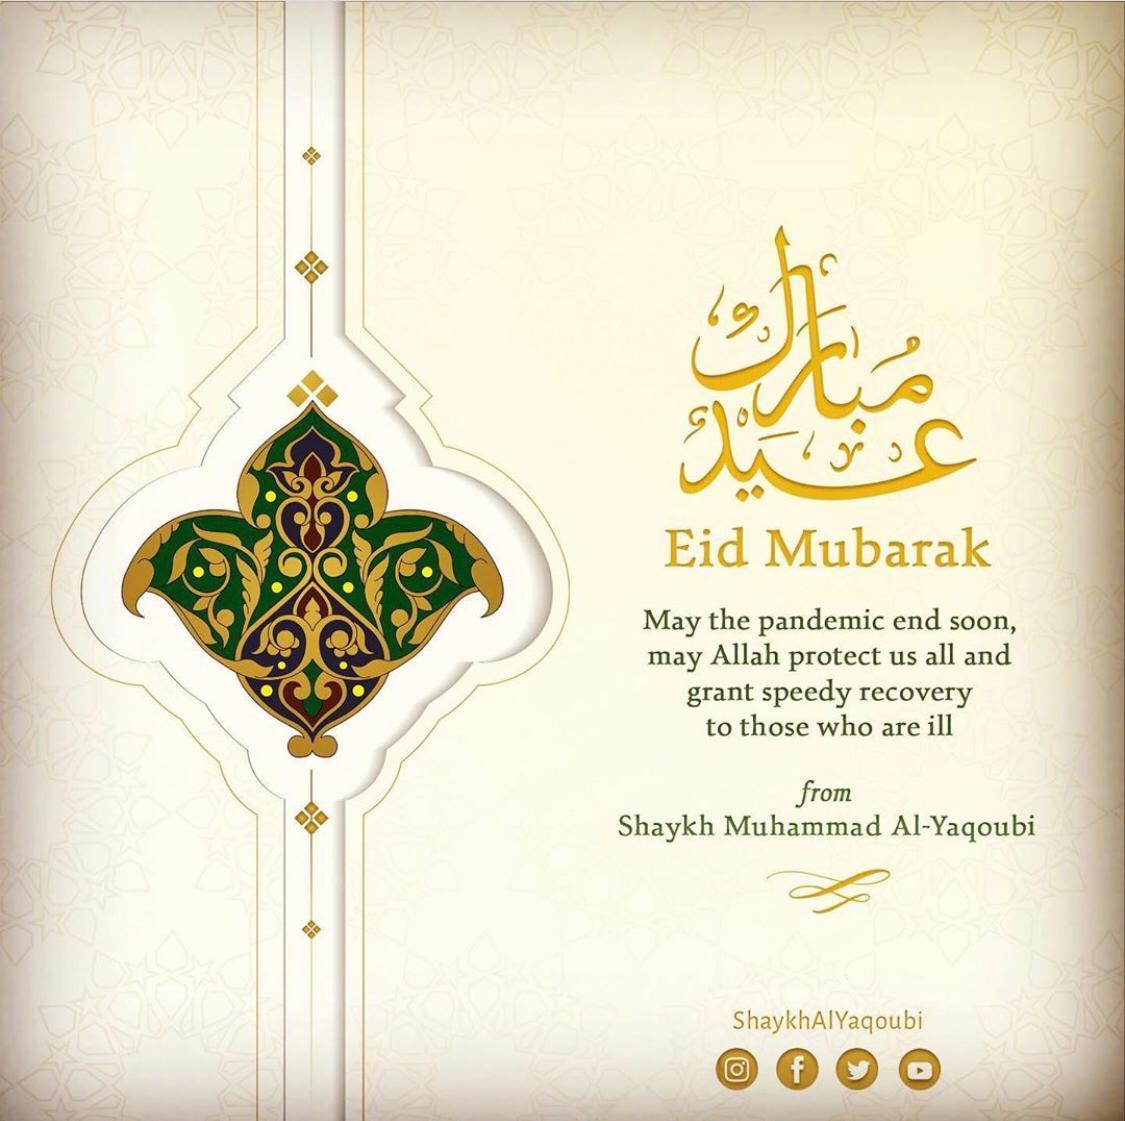 """Eid Mubarak   May you all have an #Eid that is full of joy and free from #coronavirus""  #EidAlFitr #عيد_الفطر #IdulFitri #Islam #EidUlFitrpic.twitter.com/I9rAG4m2Zy"